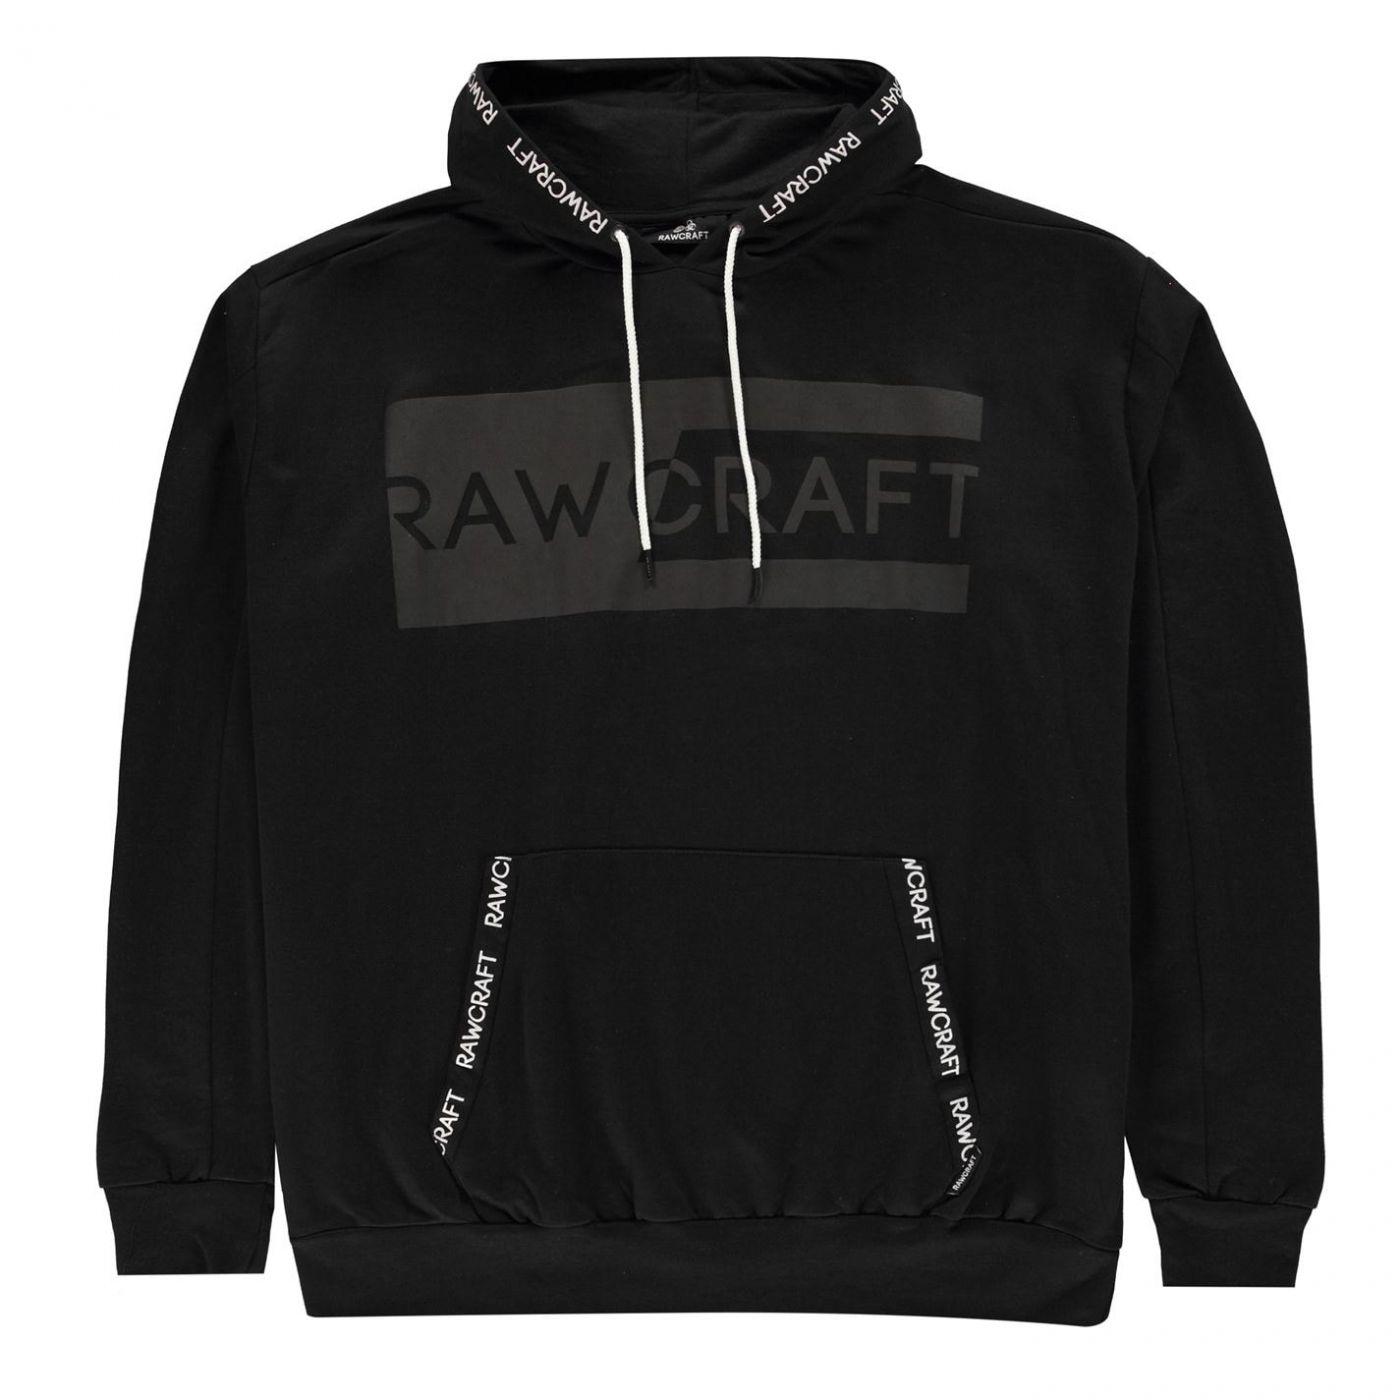 Rawcraft XL Cregan Hoody Mens